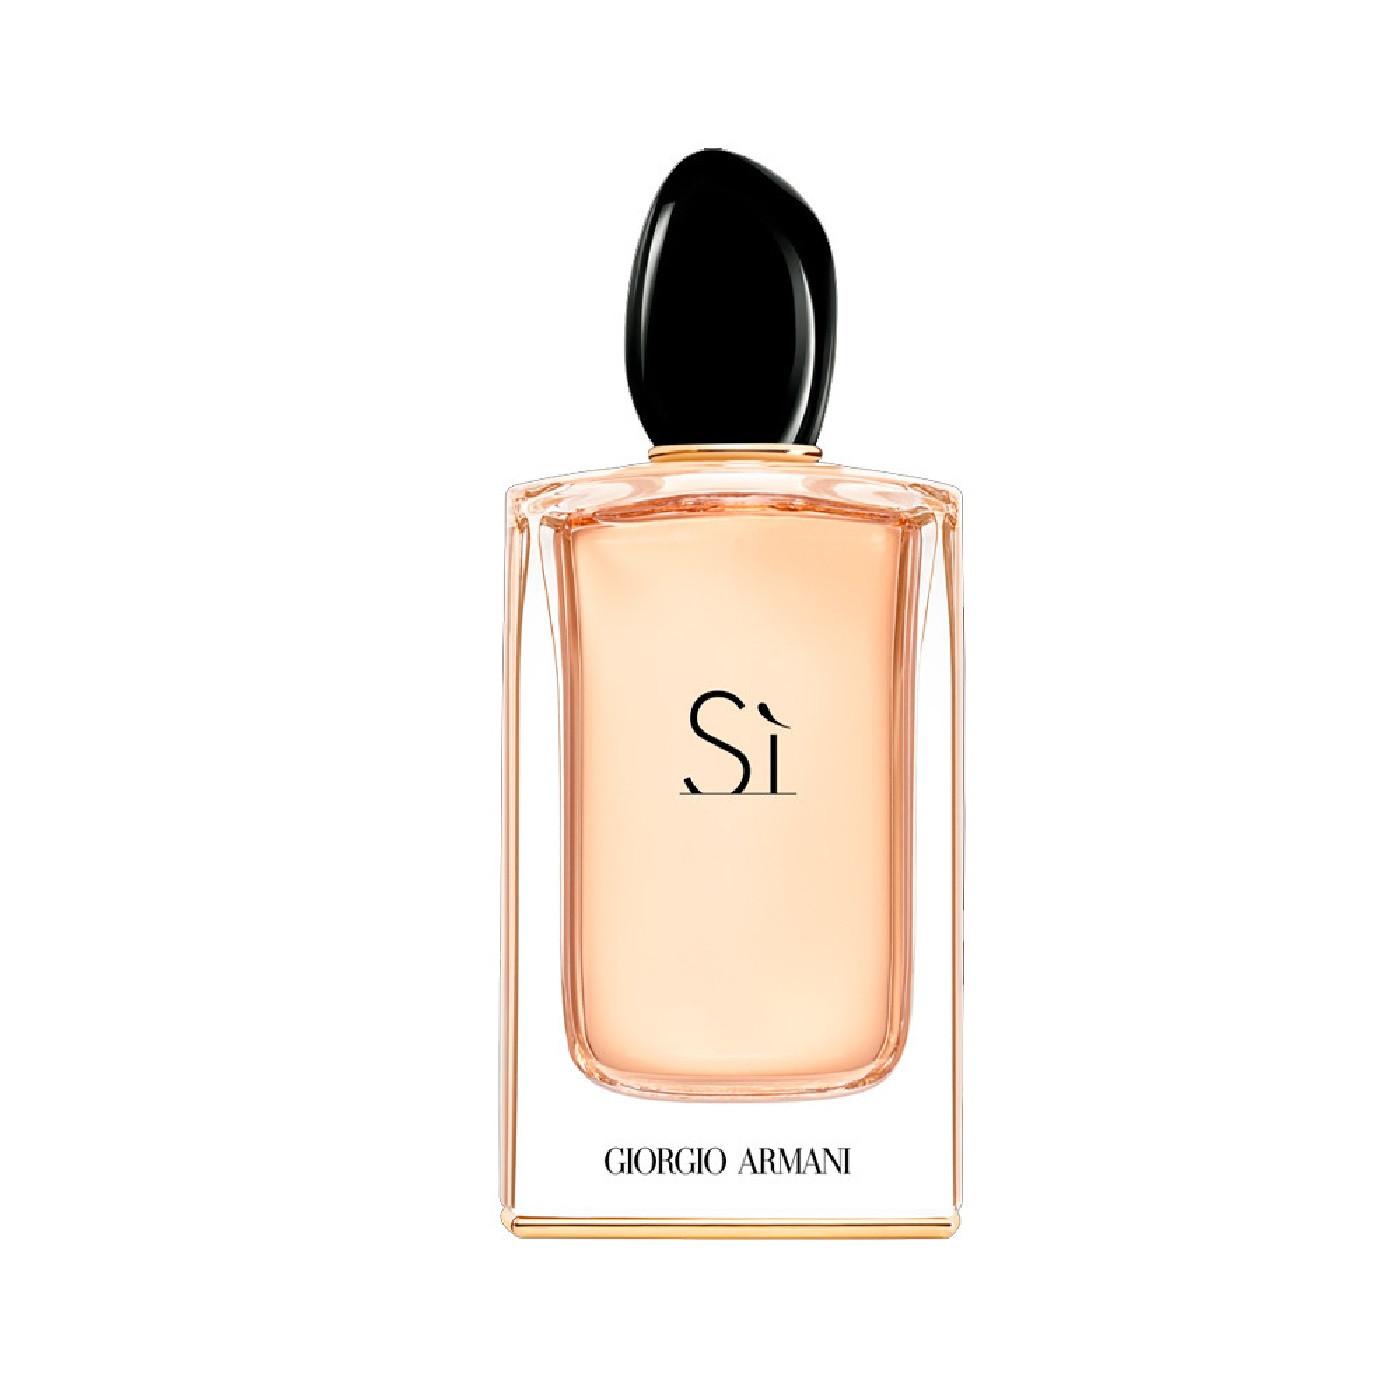 Giorgio Armani Si Eau De Parfum Spray 50 ml - Women Perfumes - Perfumes